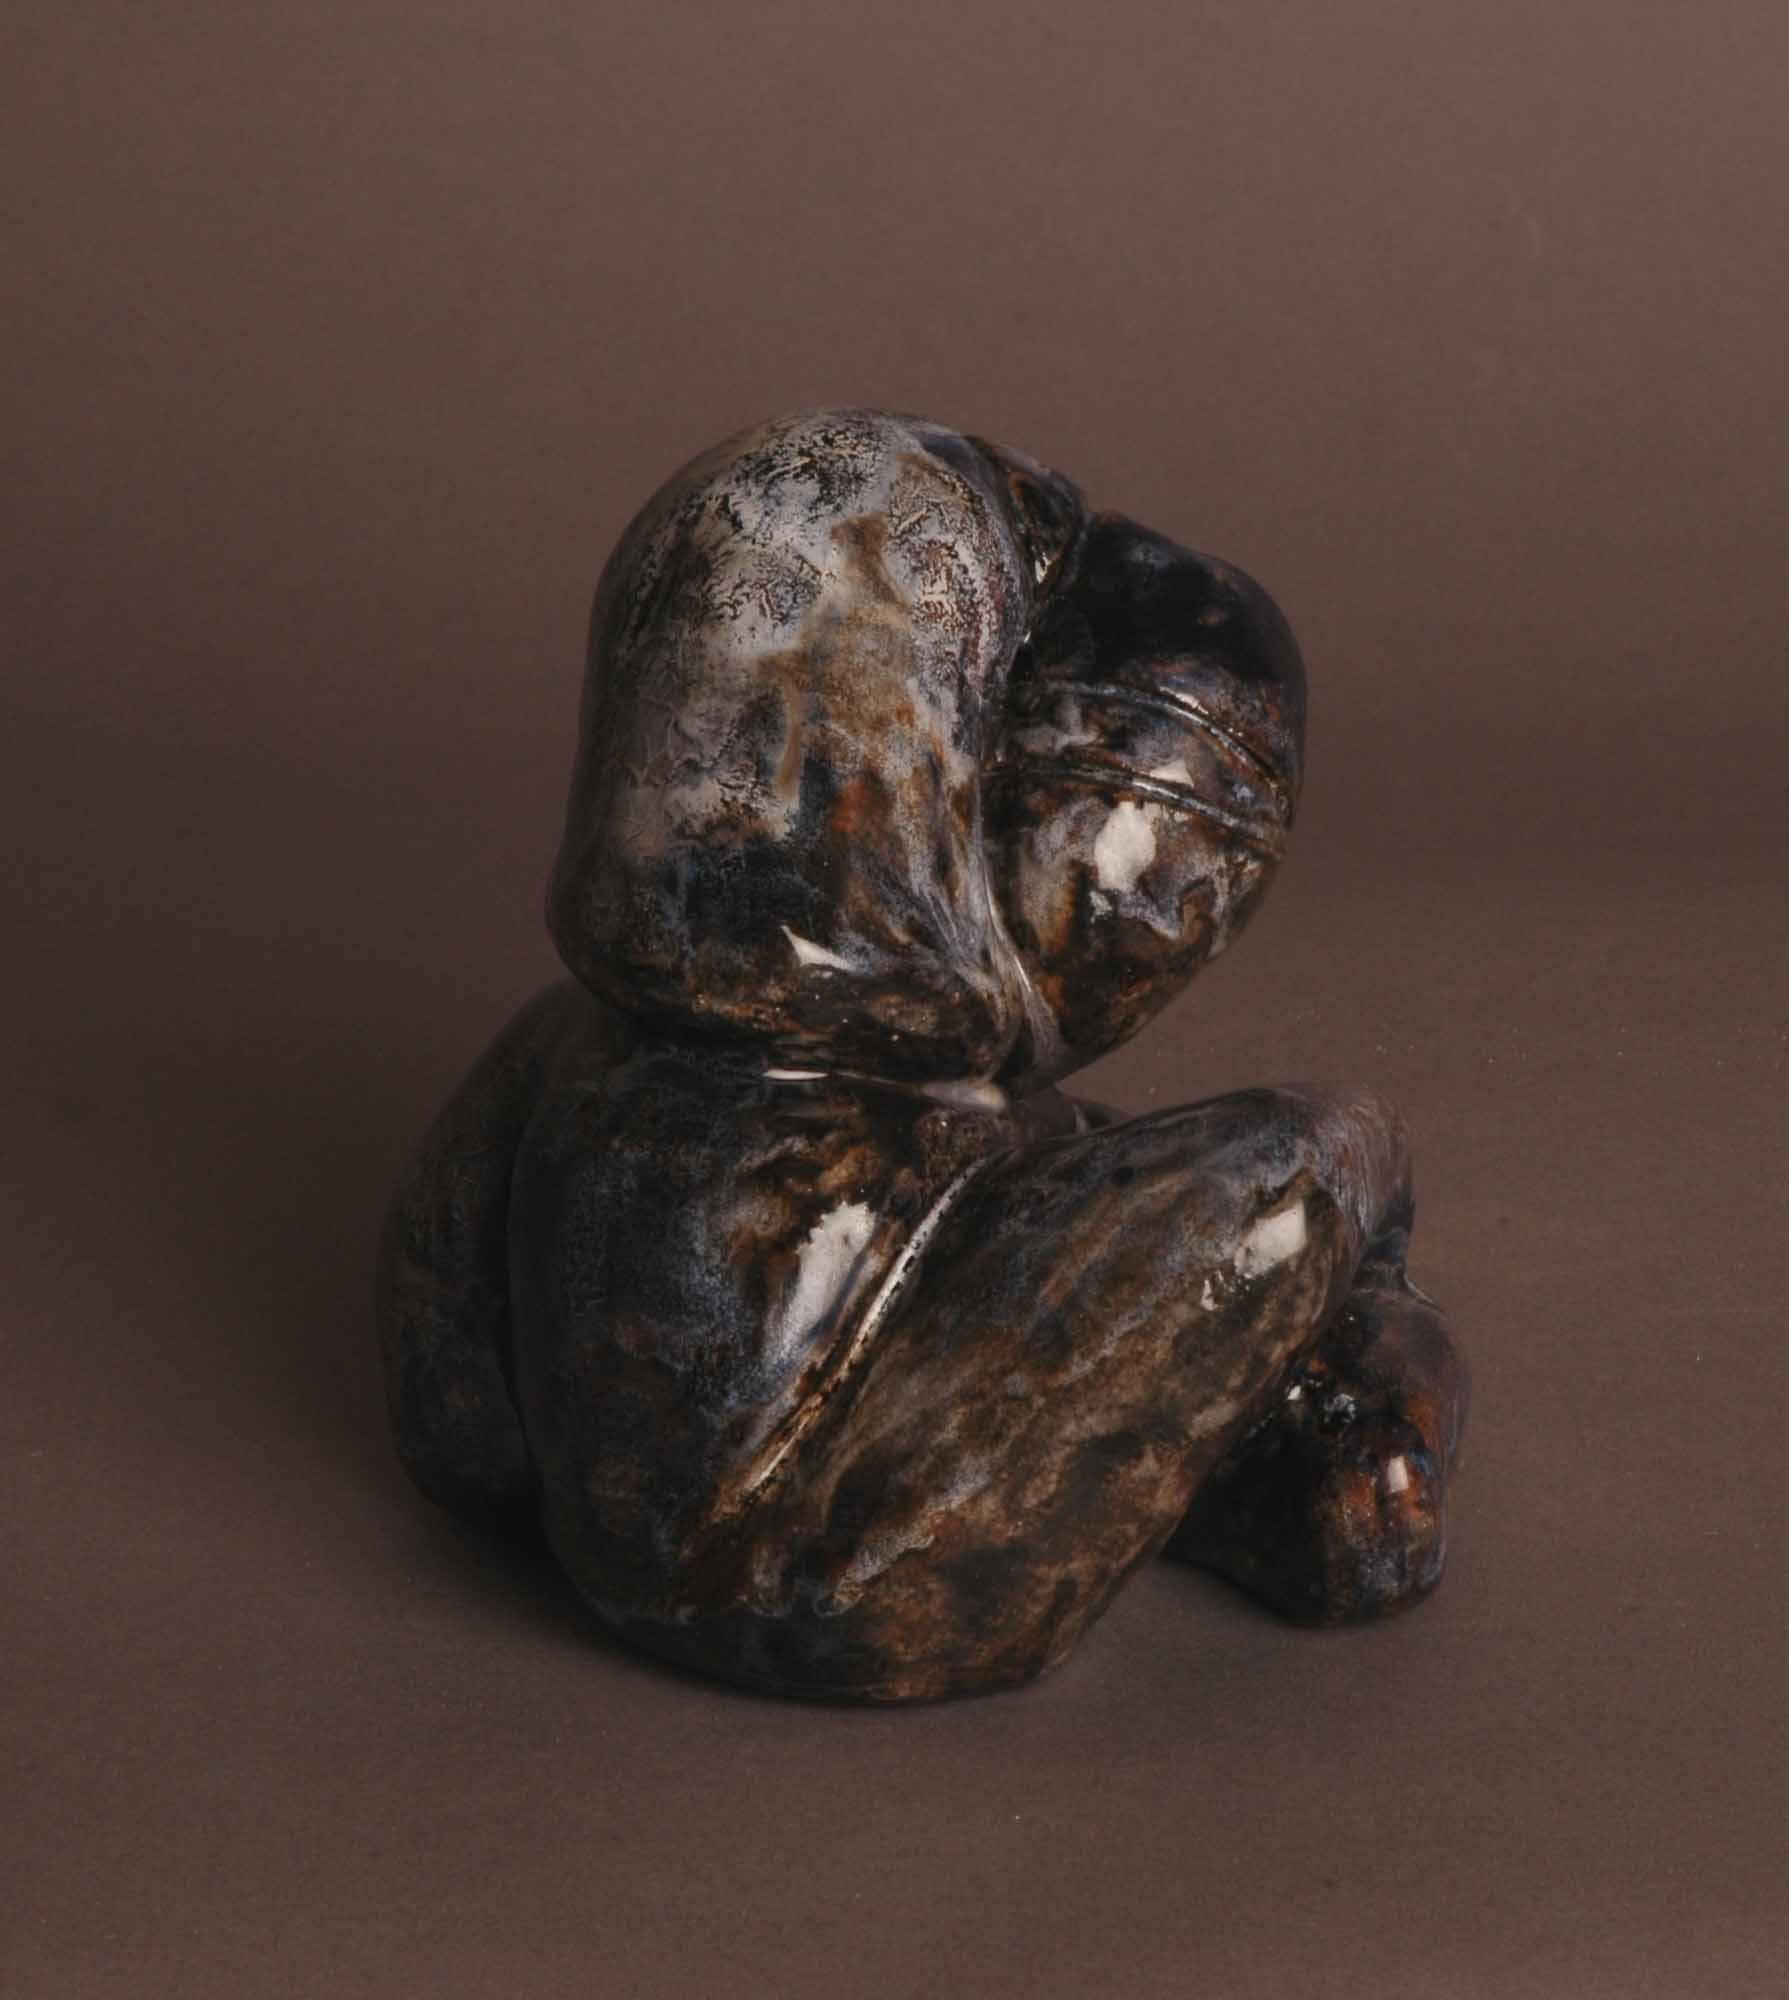 Petite femme agenouillée, 12x11x9 cm, photo Alexandra Coslin